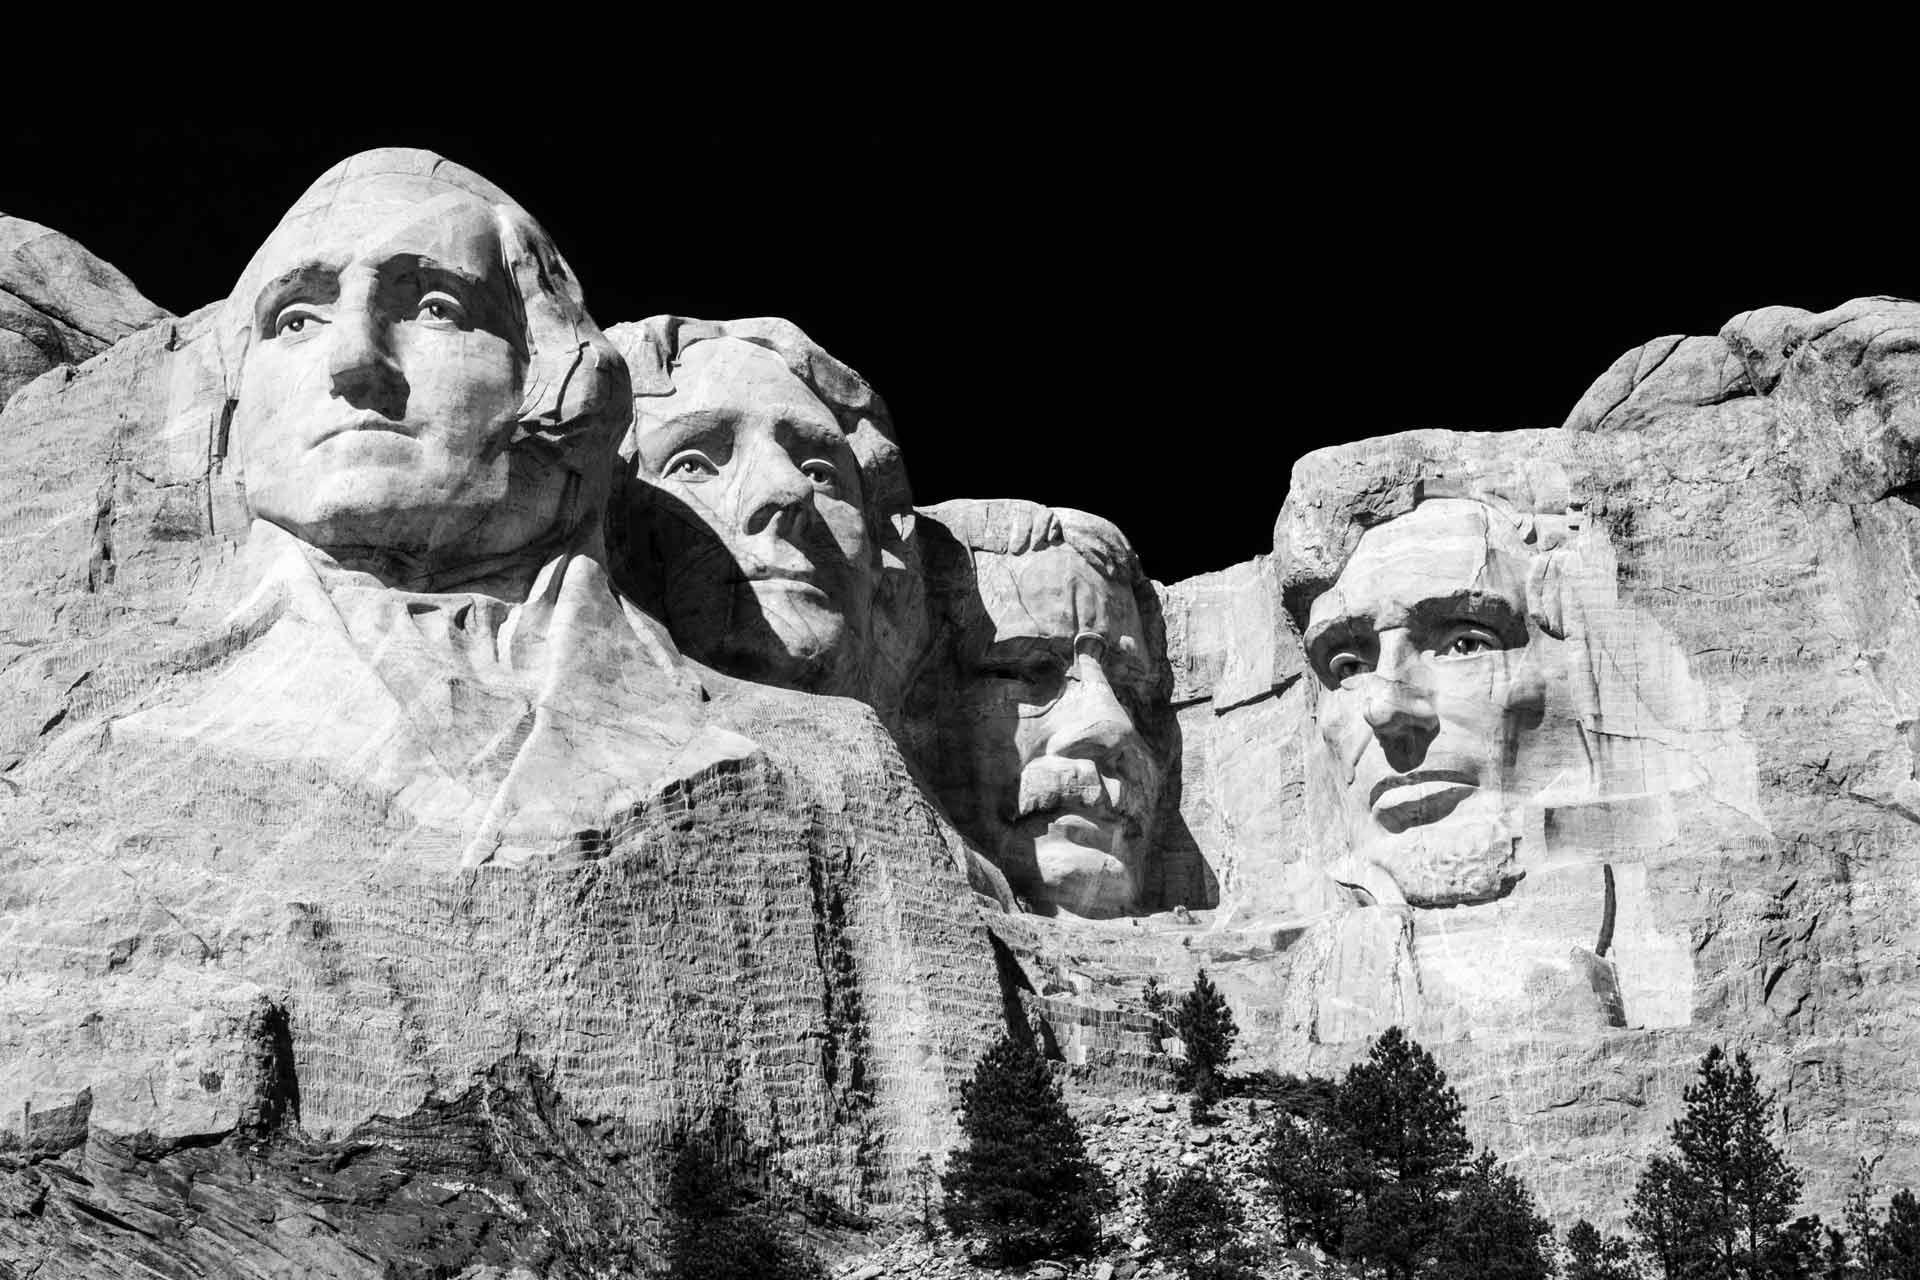 Mount Rushmore National Memorial. Photo by Brandon Mowinkel.